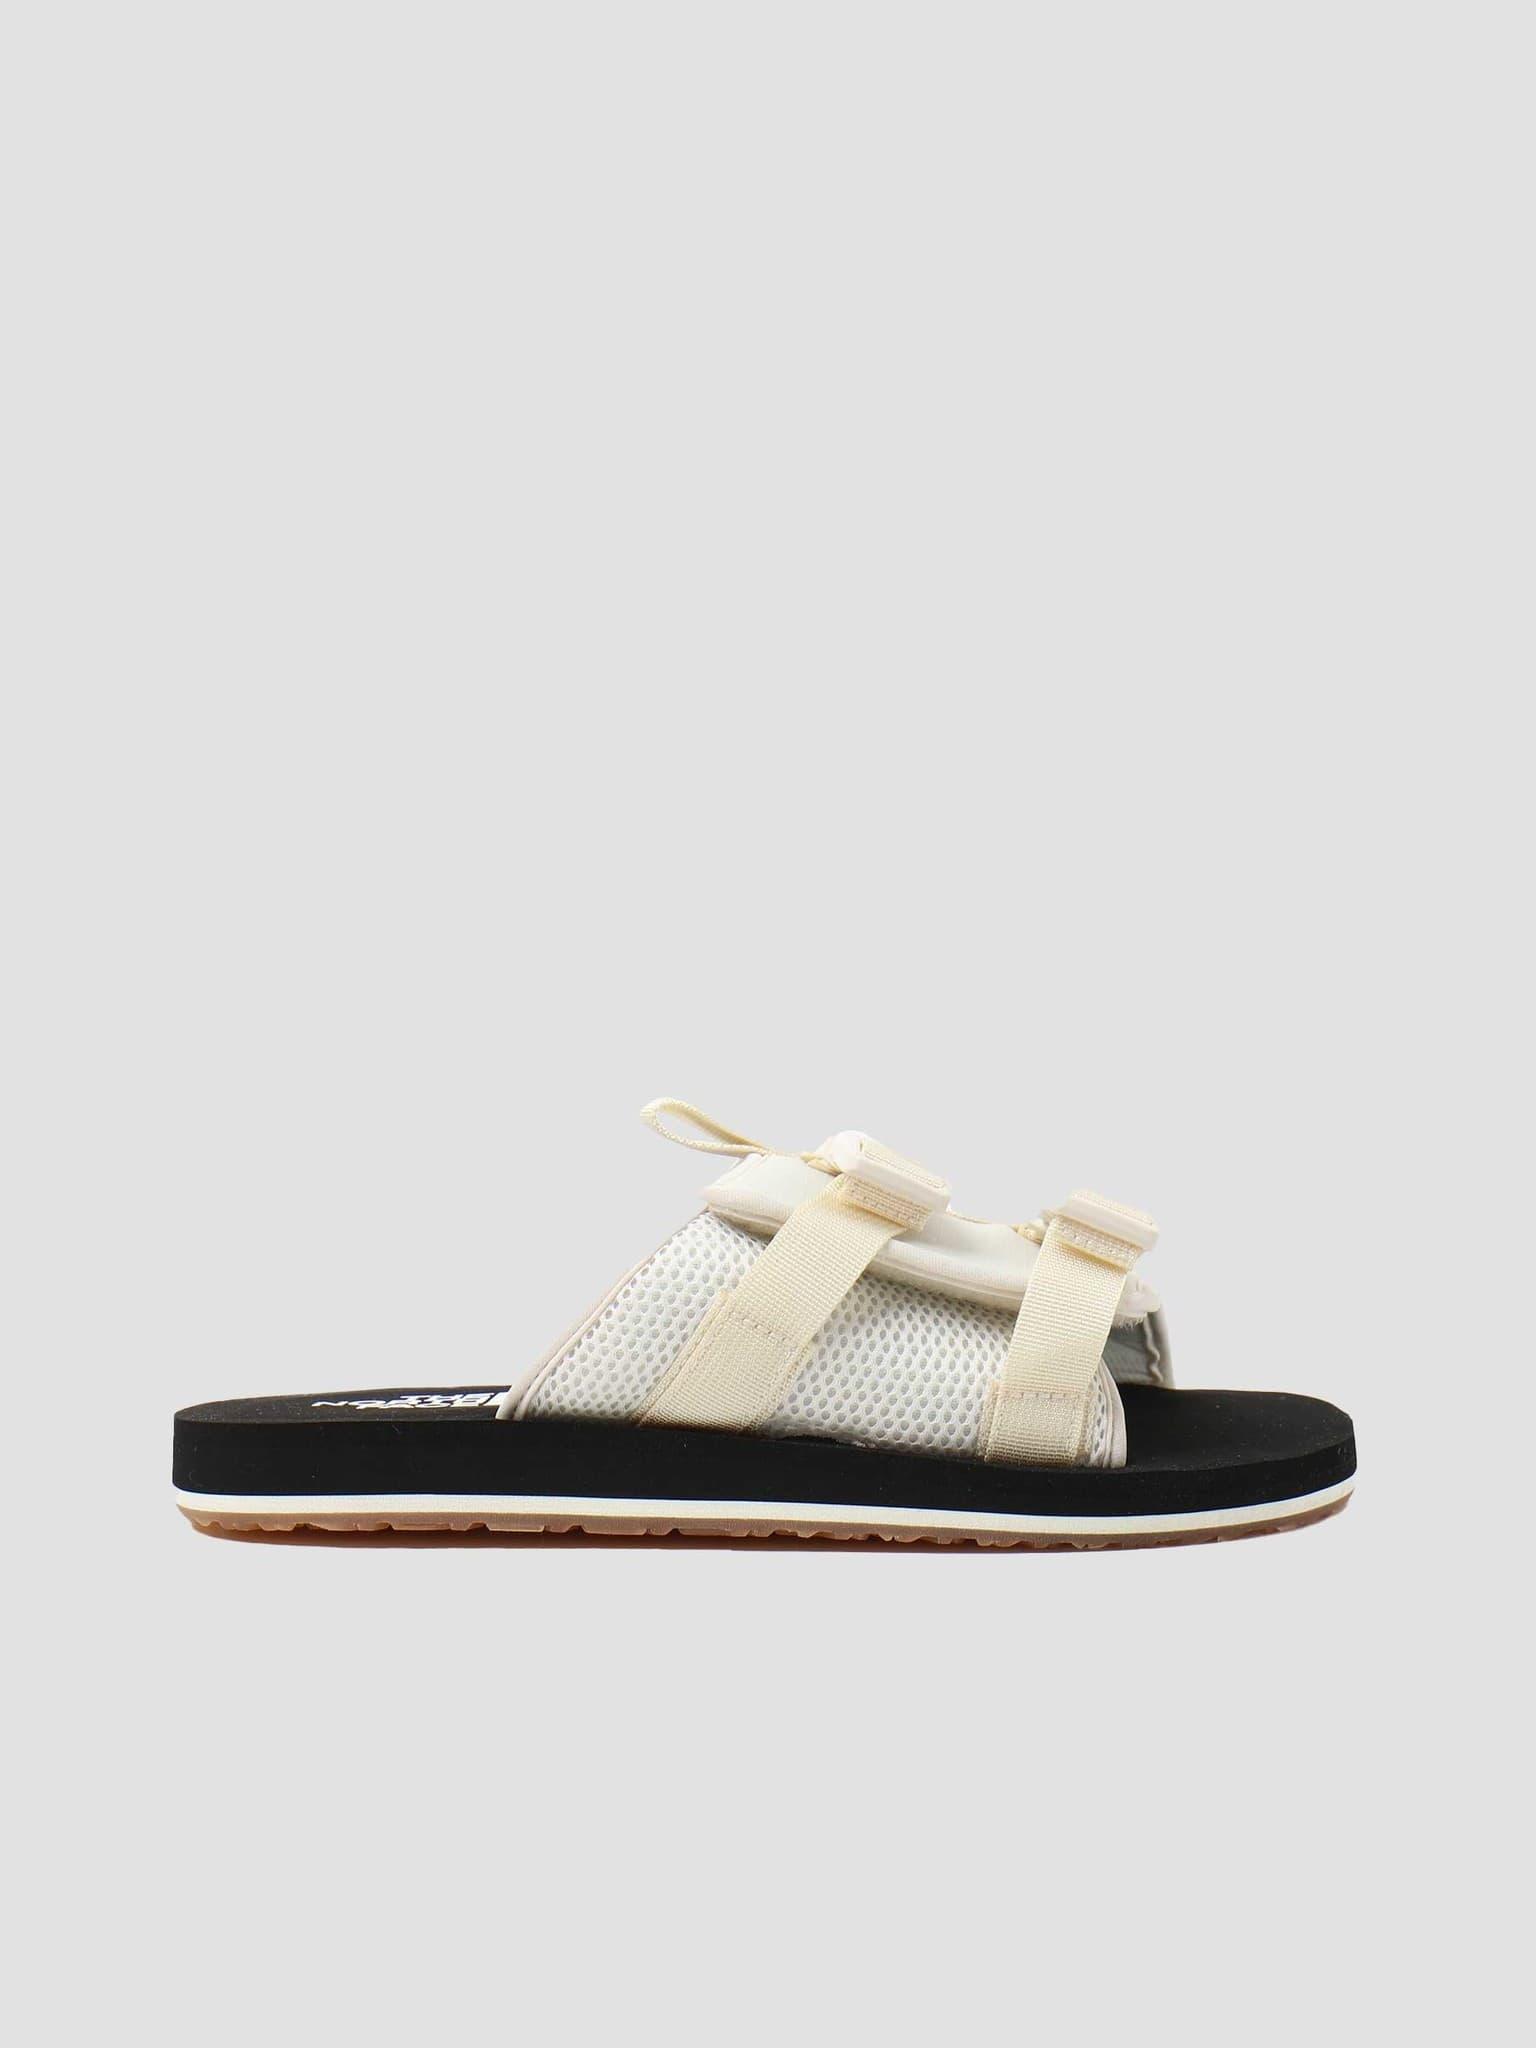 EQBC Slide Outdoor Sandal Vintage White Black NF0A46B3L0E